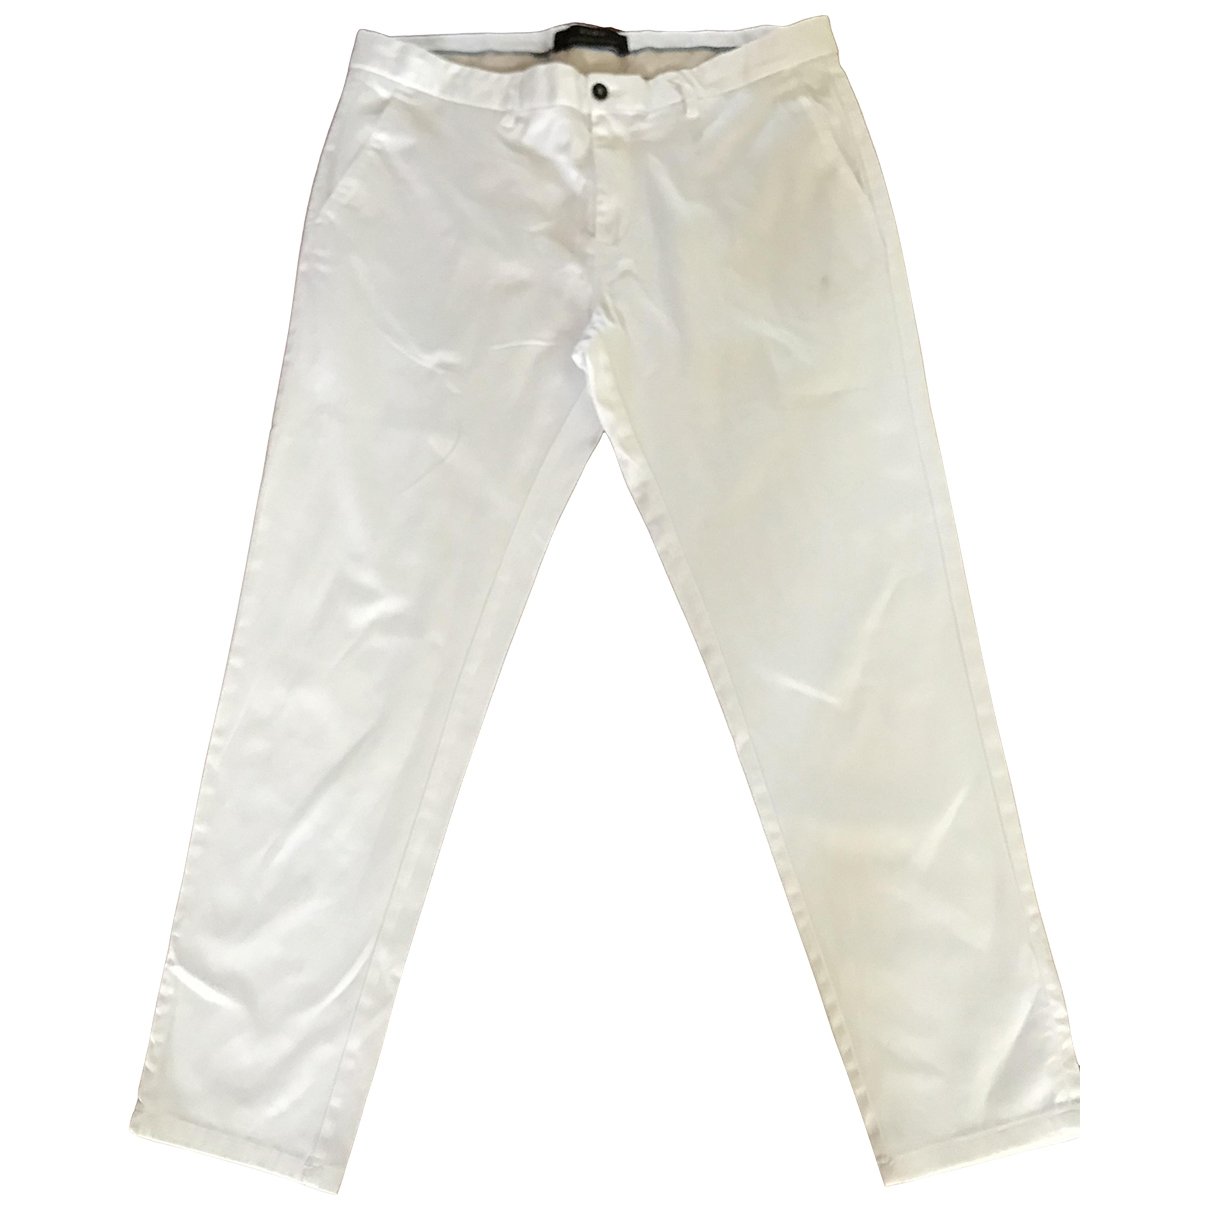 Pantalones en Algodon Crudo Zara